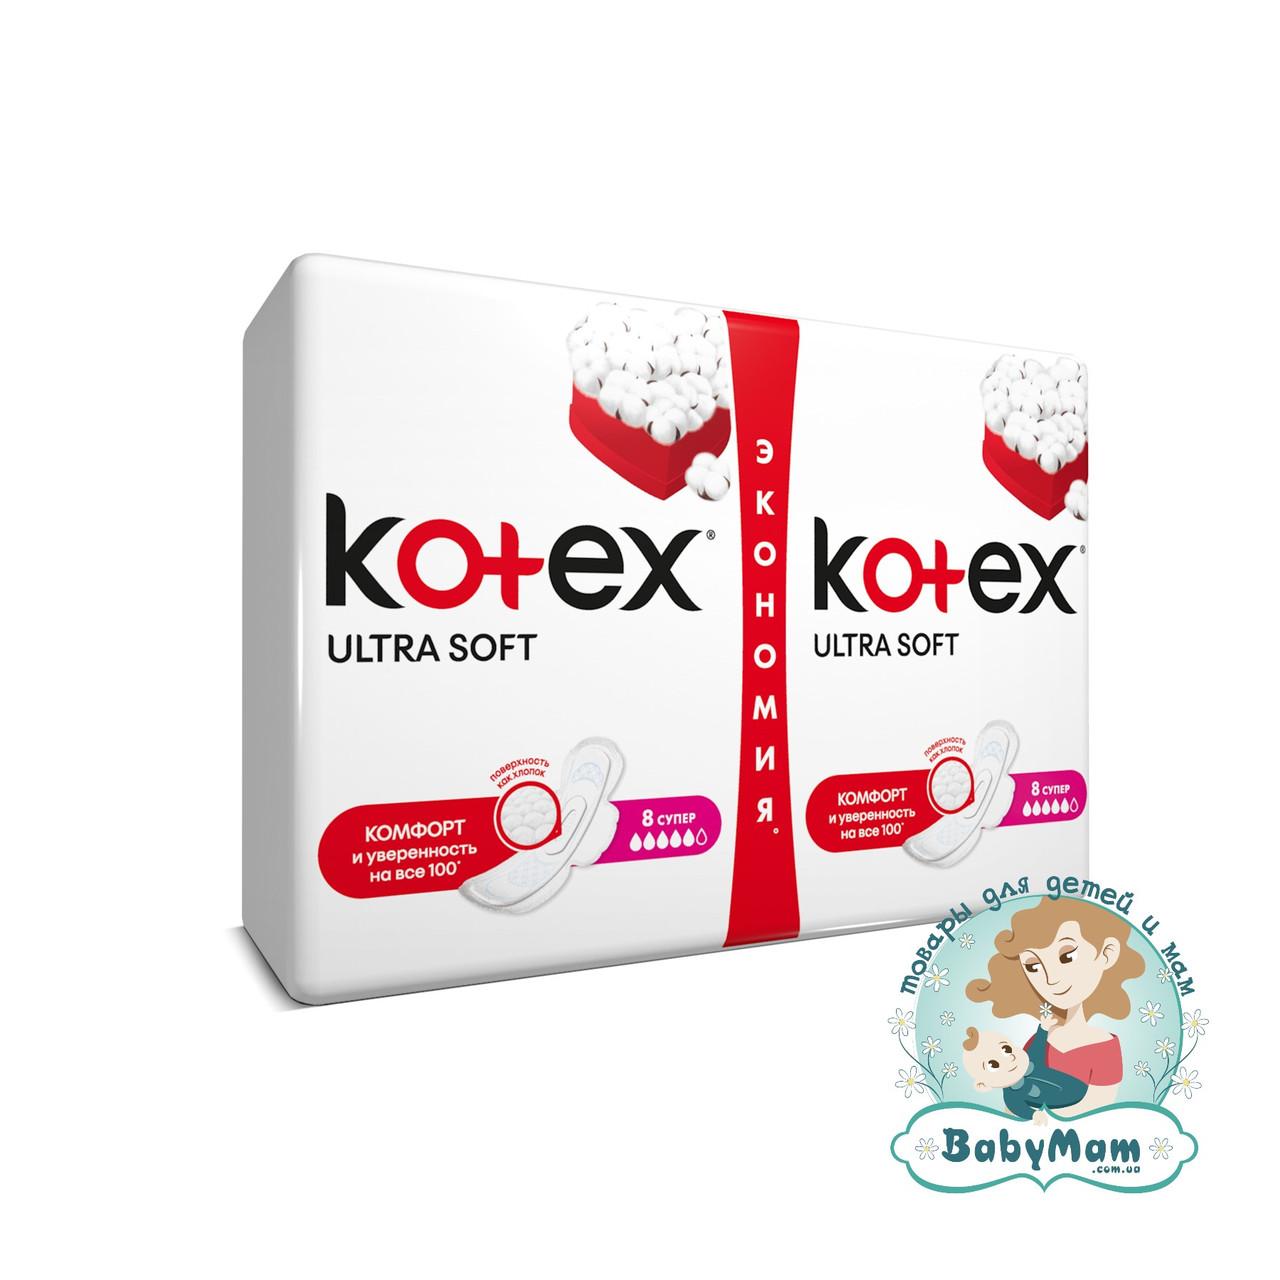 Гигиенические прокладки Kotex Ultra Soft Супер, 16шт.